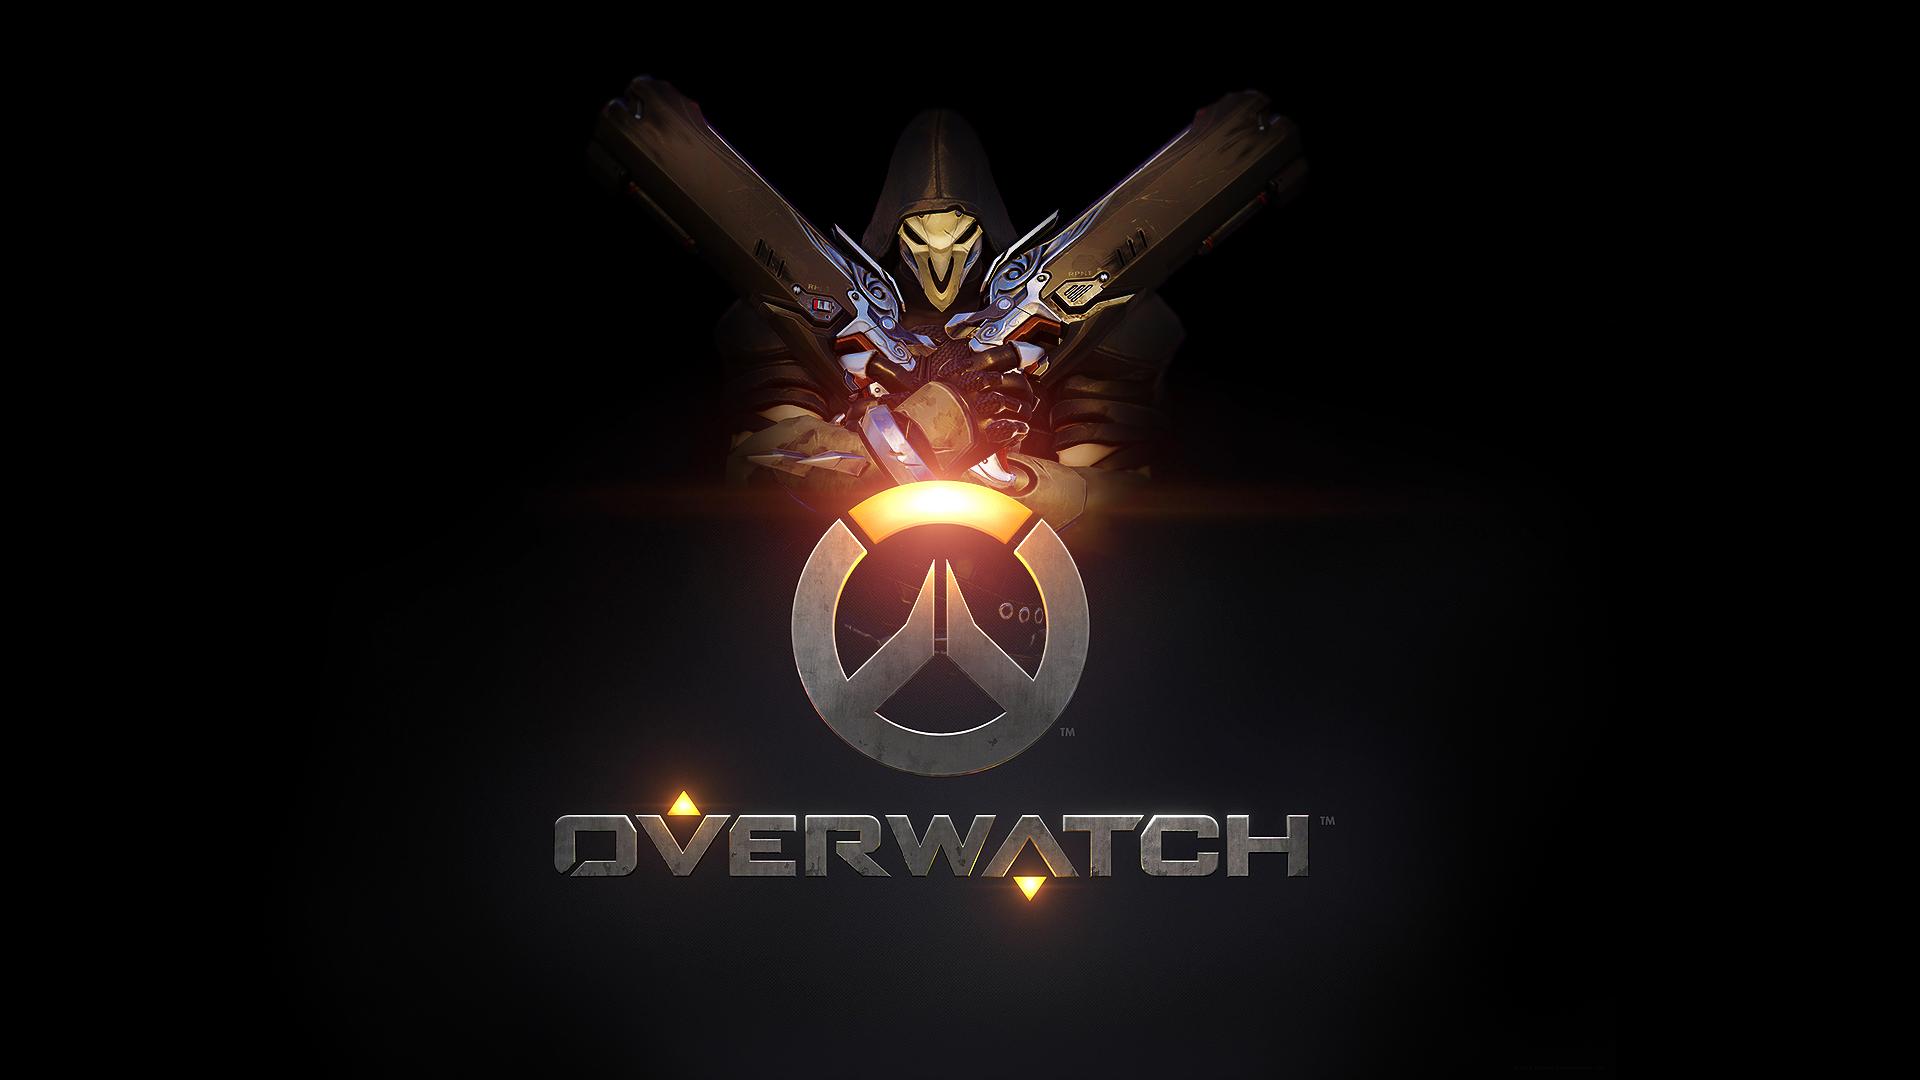 47 Overwatch 1080p Wallpaper On Wallpapersafari